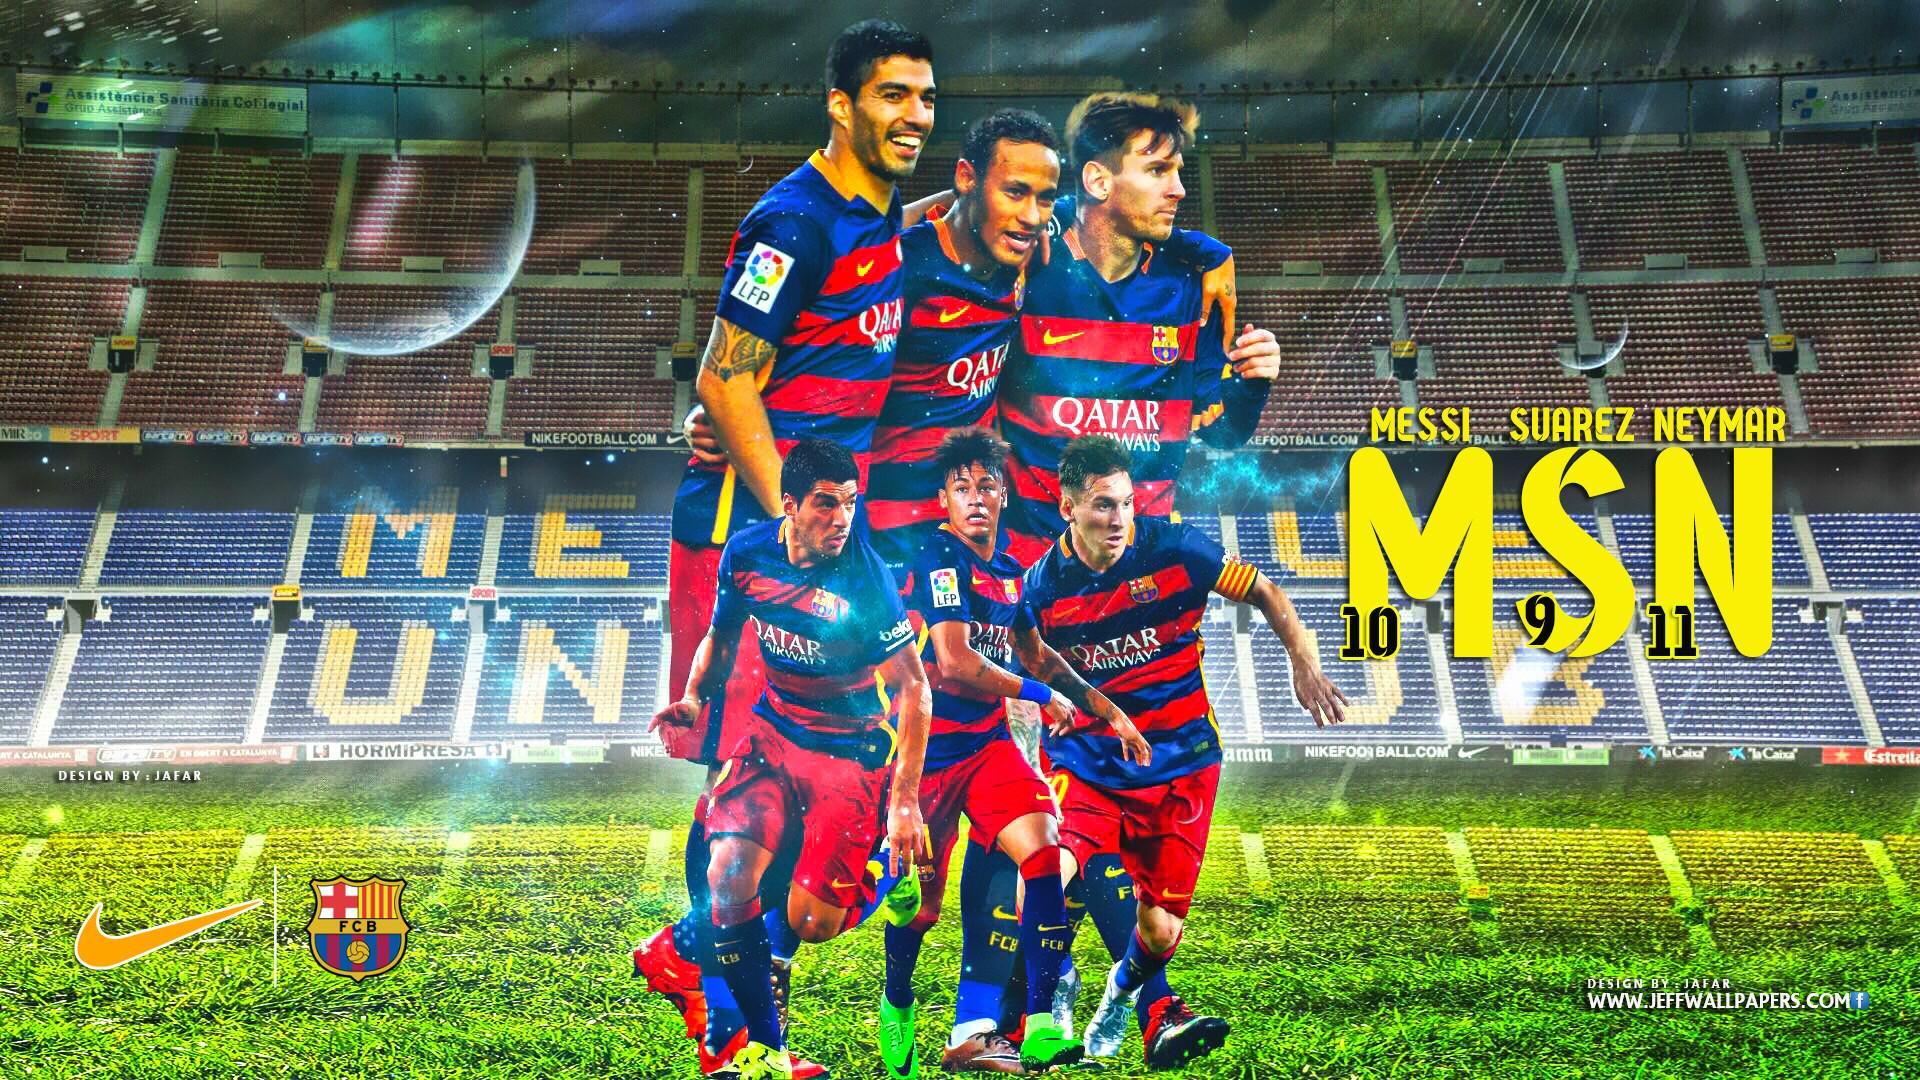 MSN FC BARCELONA WALLPAPER.